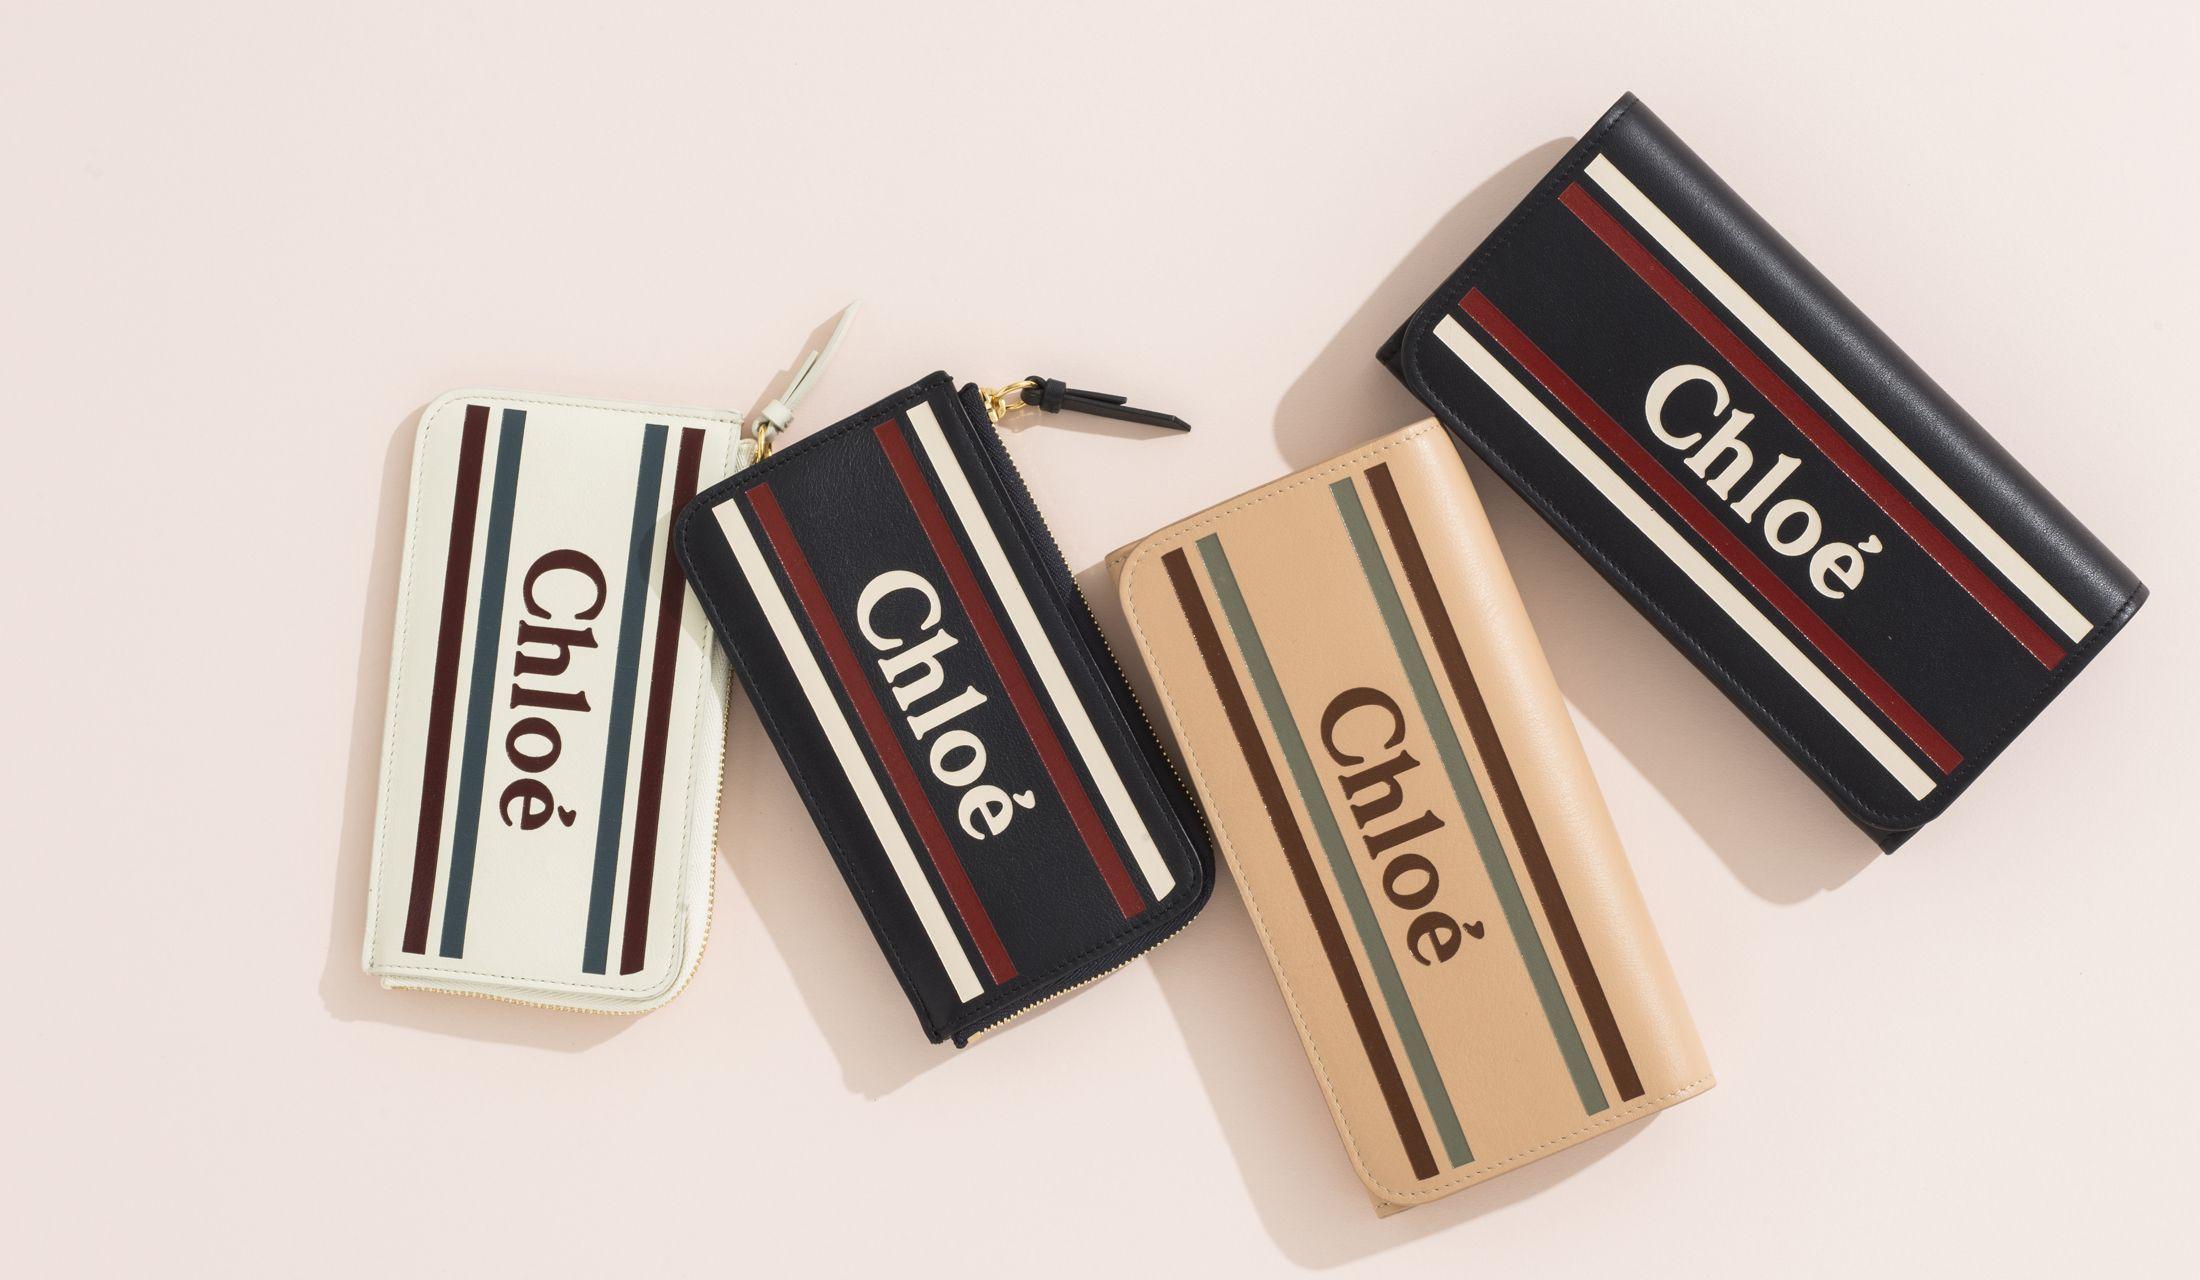 Chloé(クロエ)の新作財布の画像